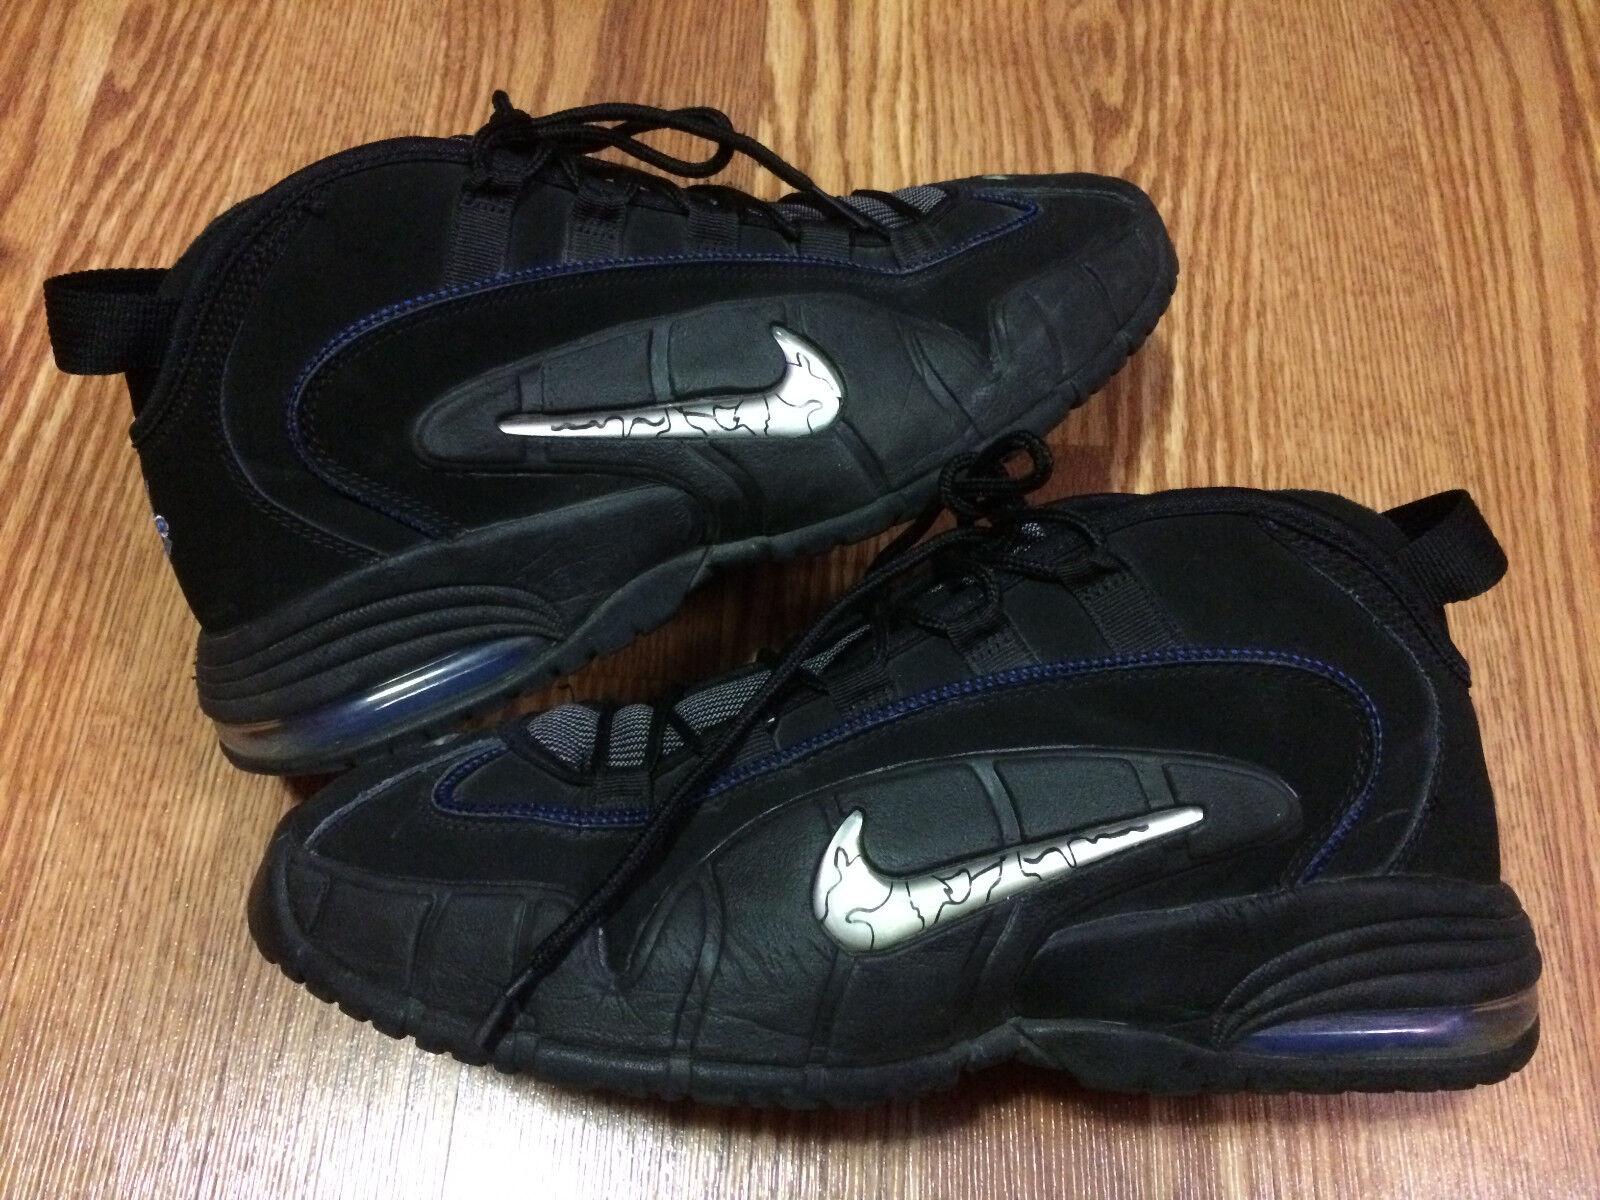 pretty nice be25a 4f791 Nike Air Max Penny 1 685153-001 Black Game Royal-Metallic Silver-White SZ  12 new